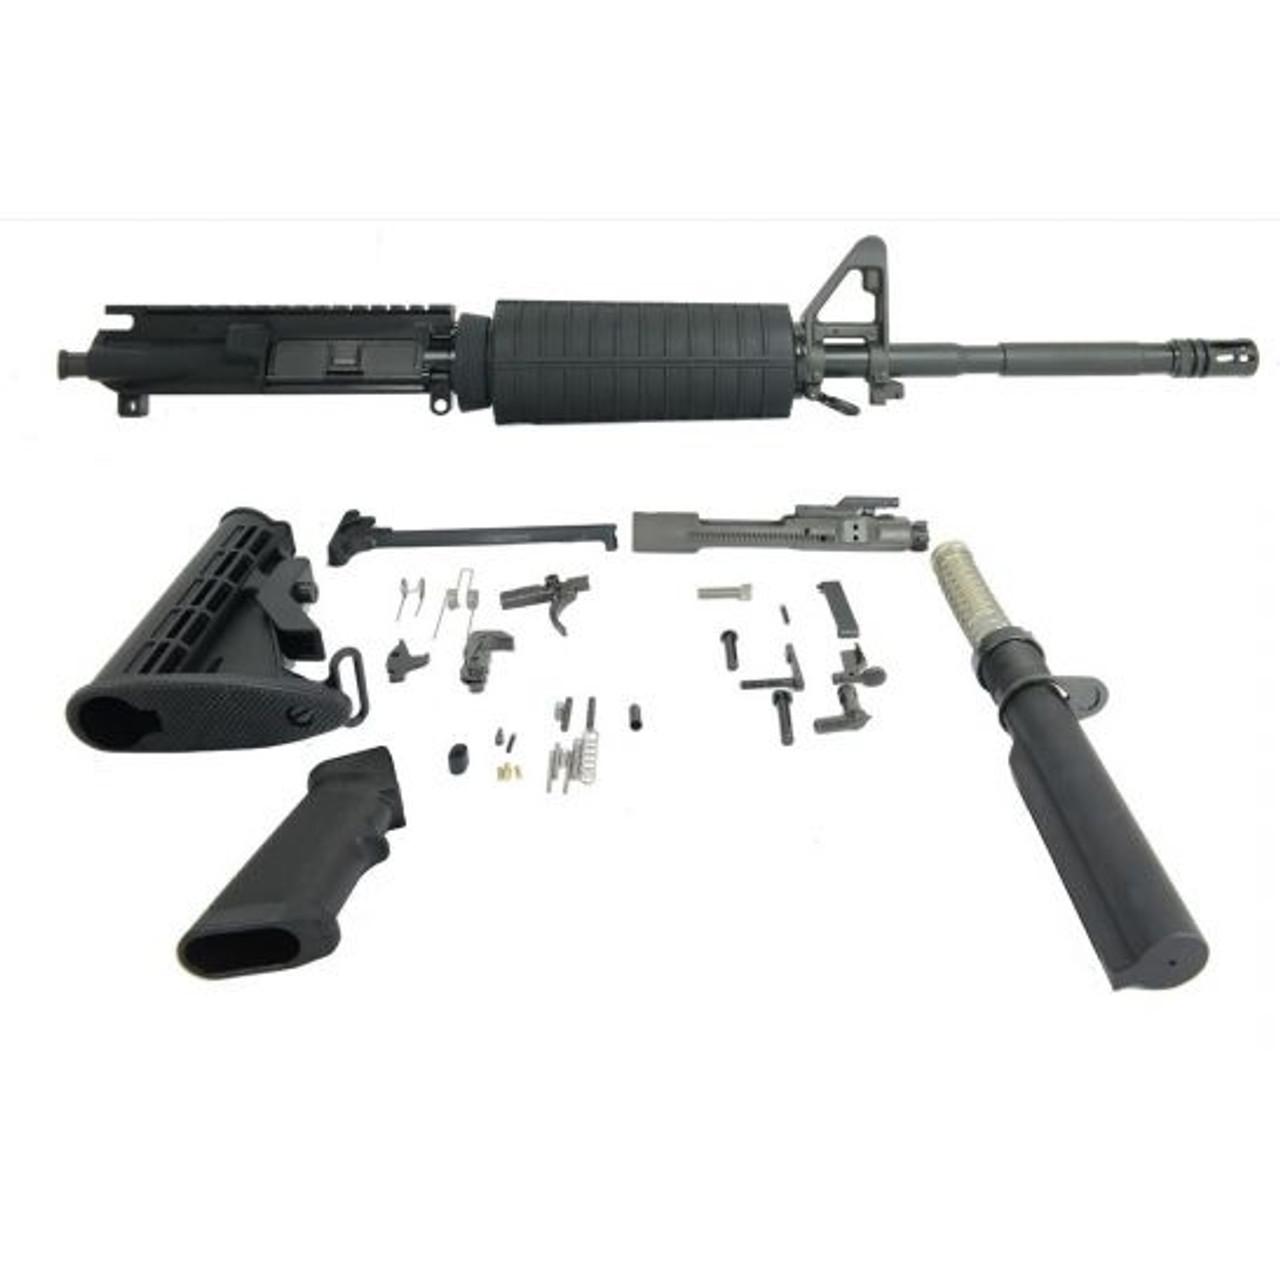 PSA Rifle Kit  M4 Carbine Classic CALIFORNIA LEGAL - 5.56 - NO MAGAZINE OR AR MAGLOCK